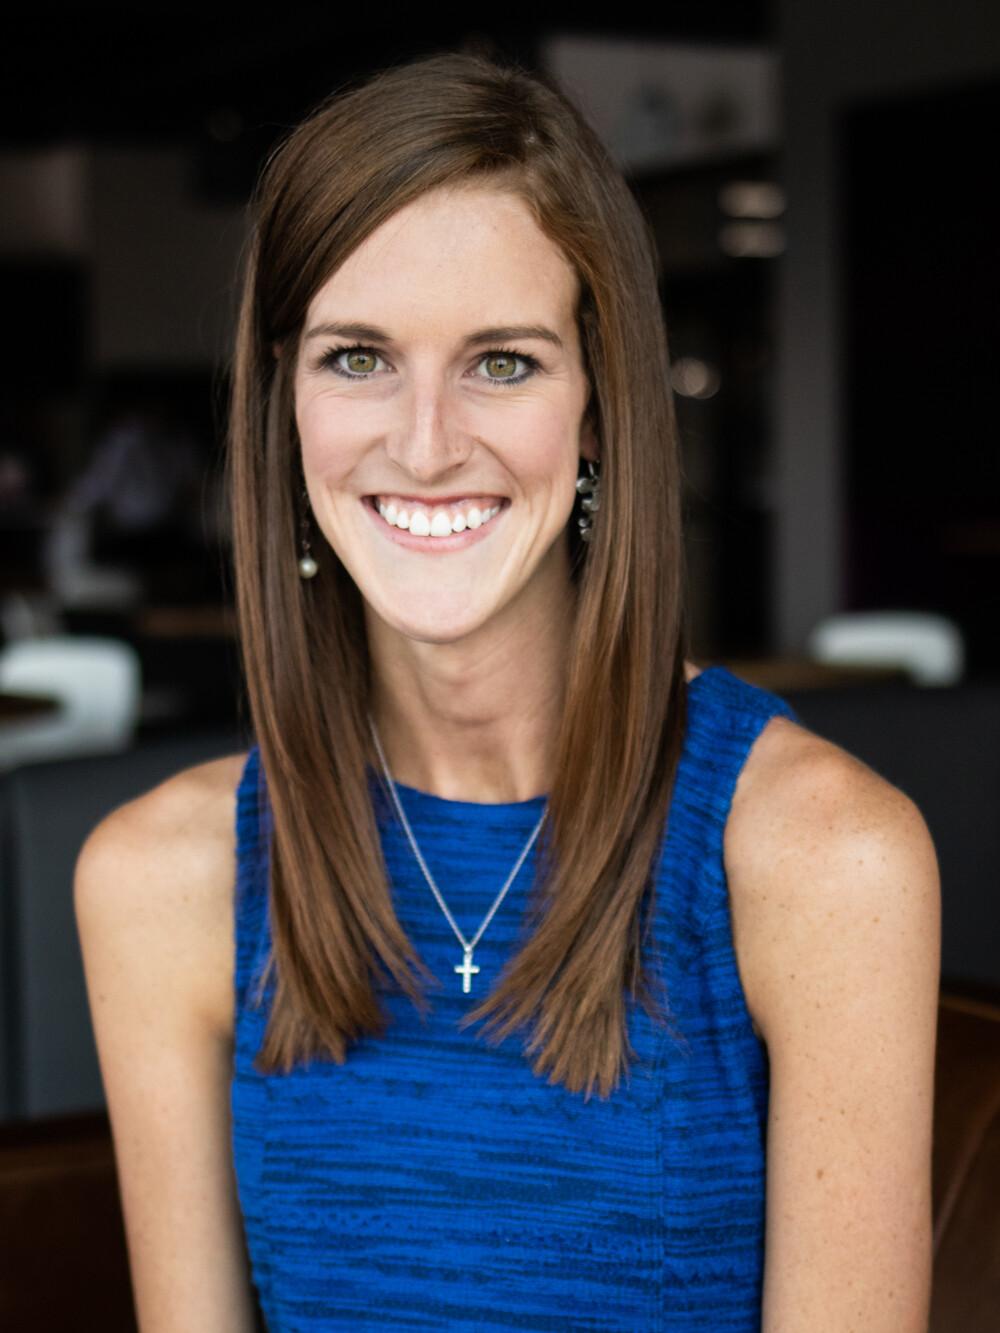 Megan Dyer, Strategist at Choozle